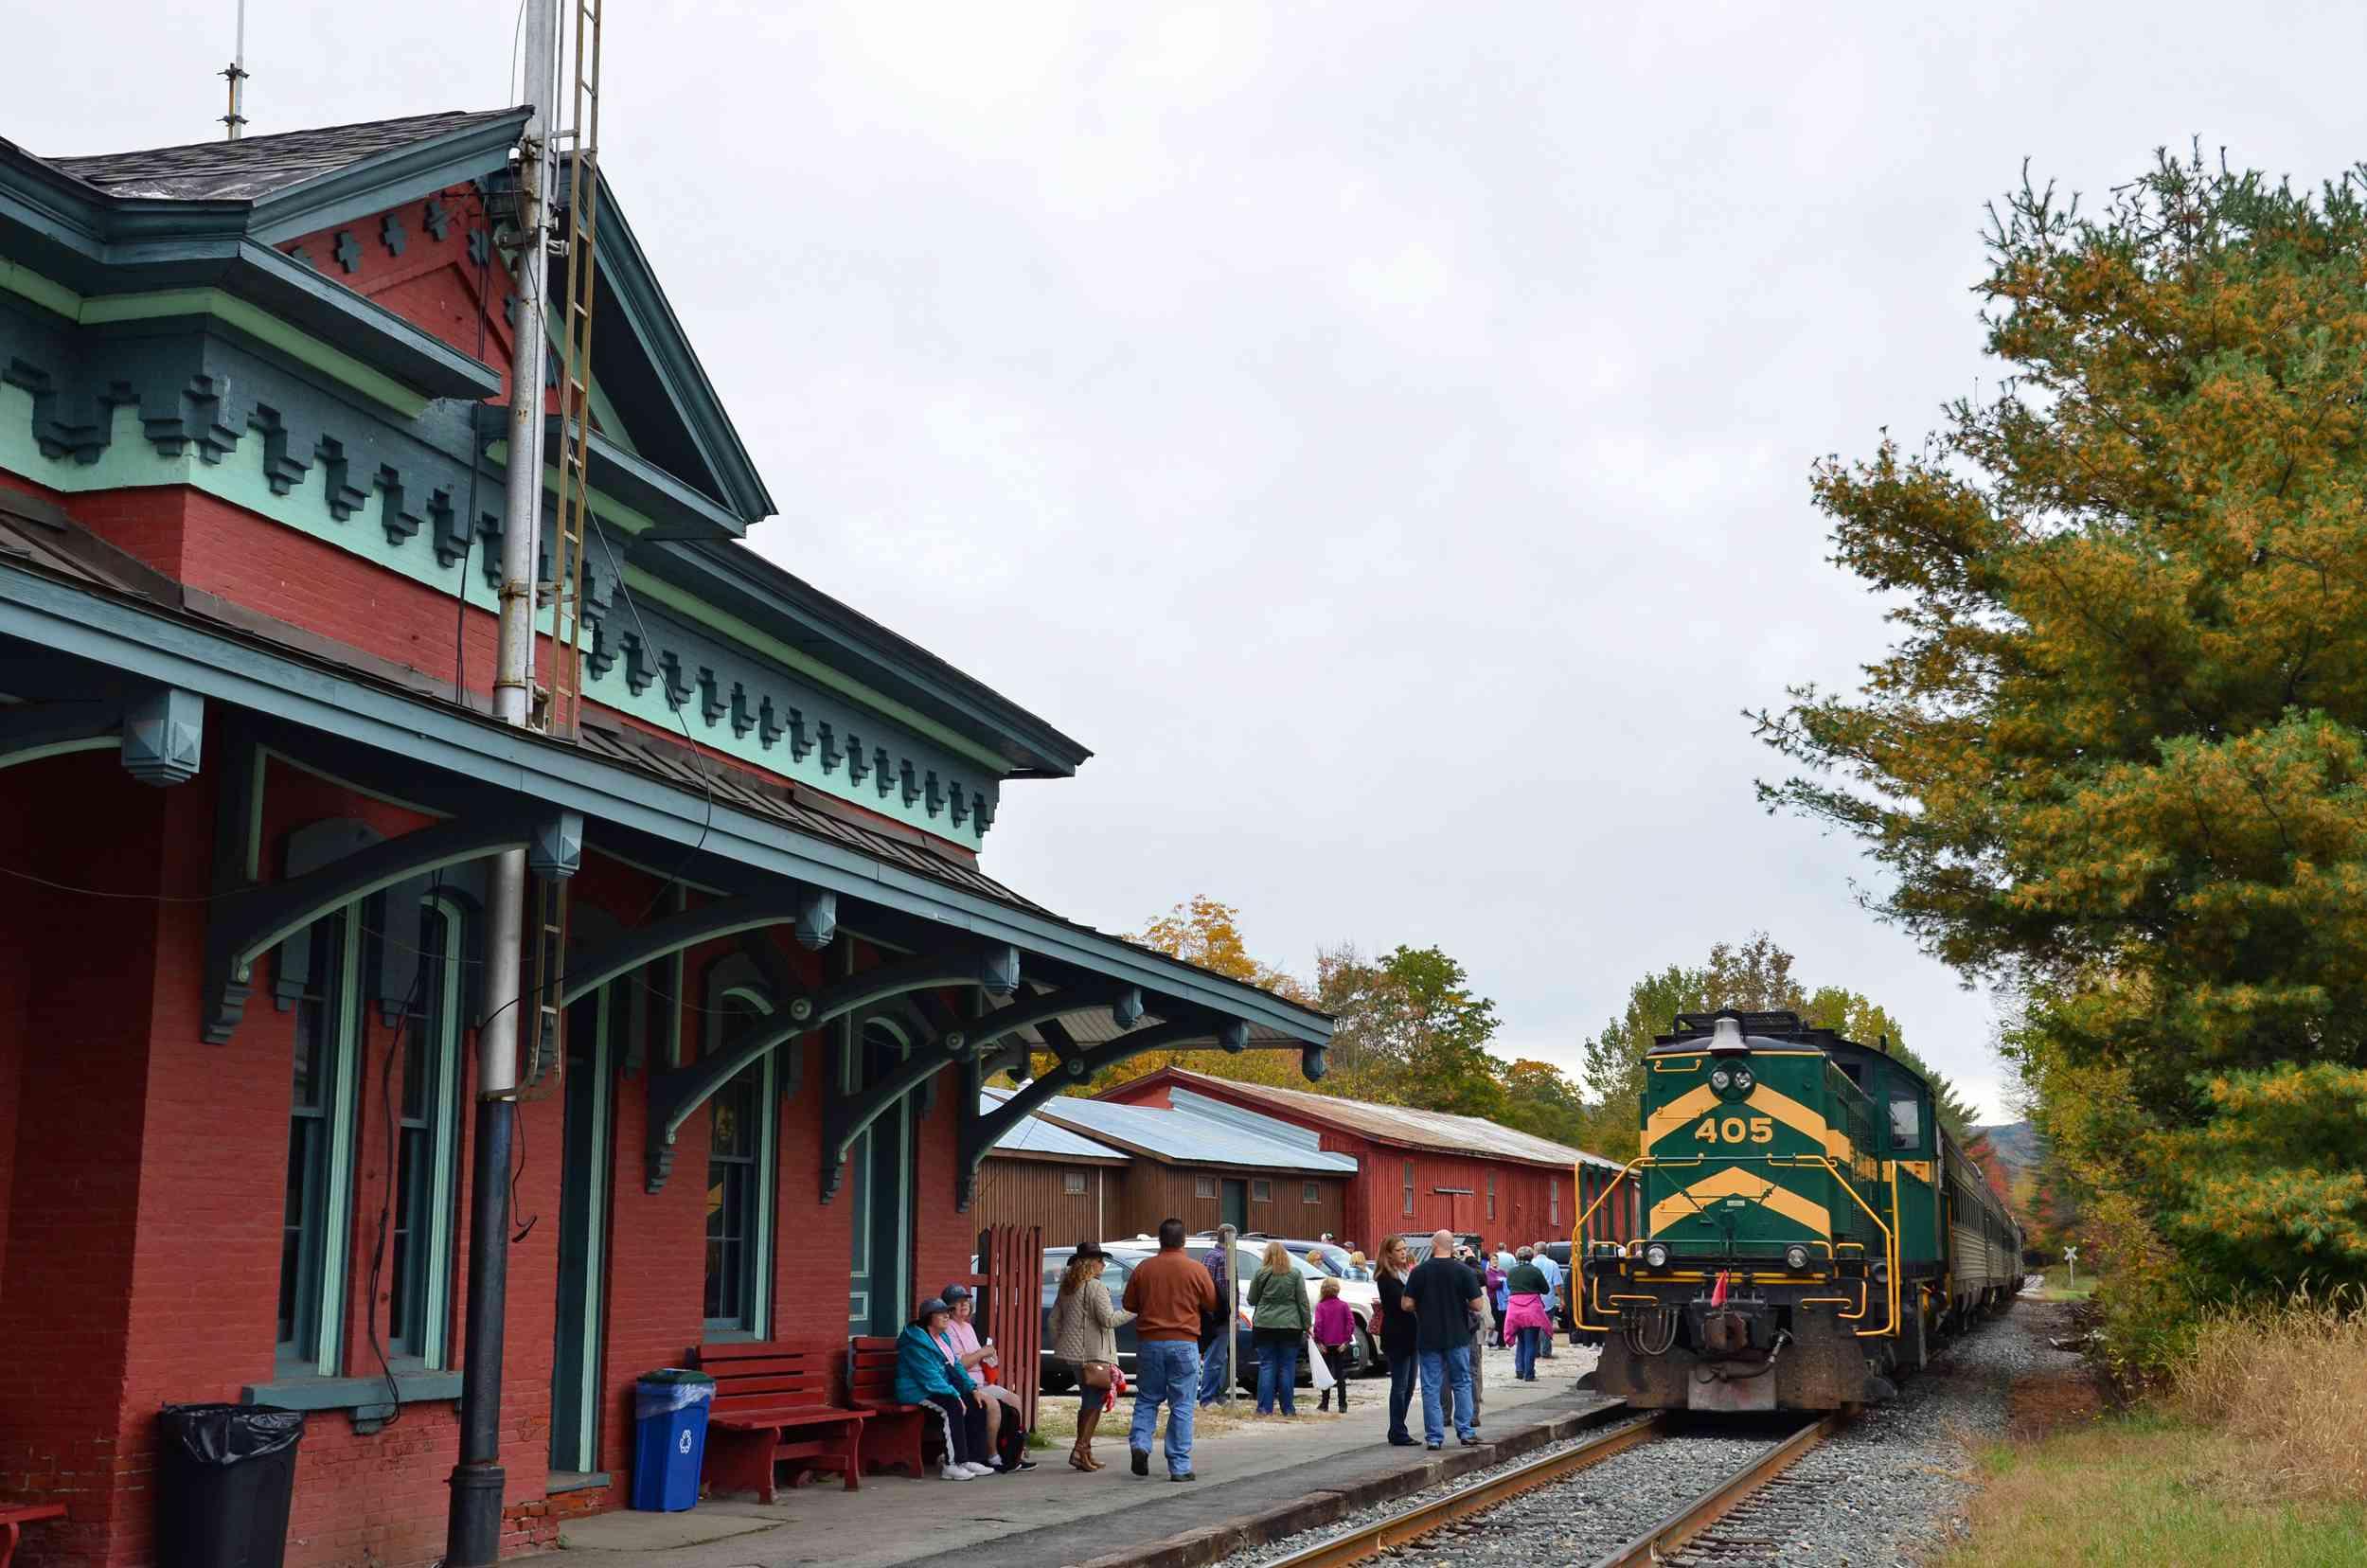 Green Mountain Railroad Fall Foliage Train Rides in Vermont